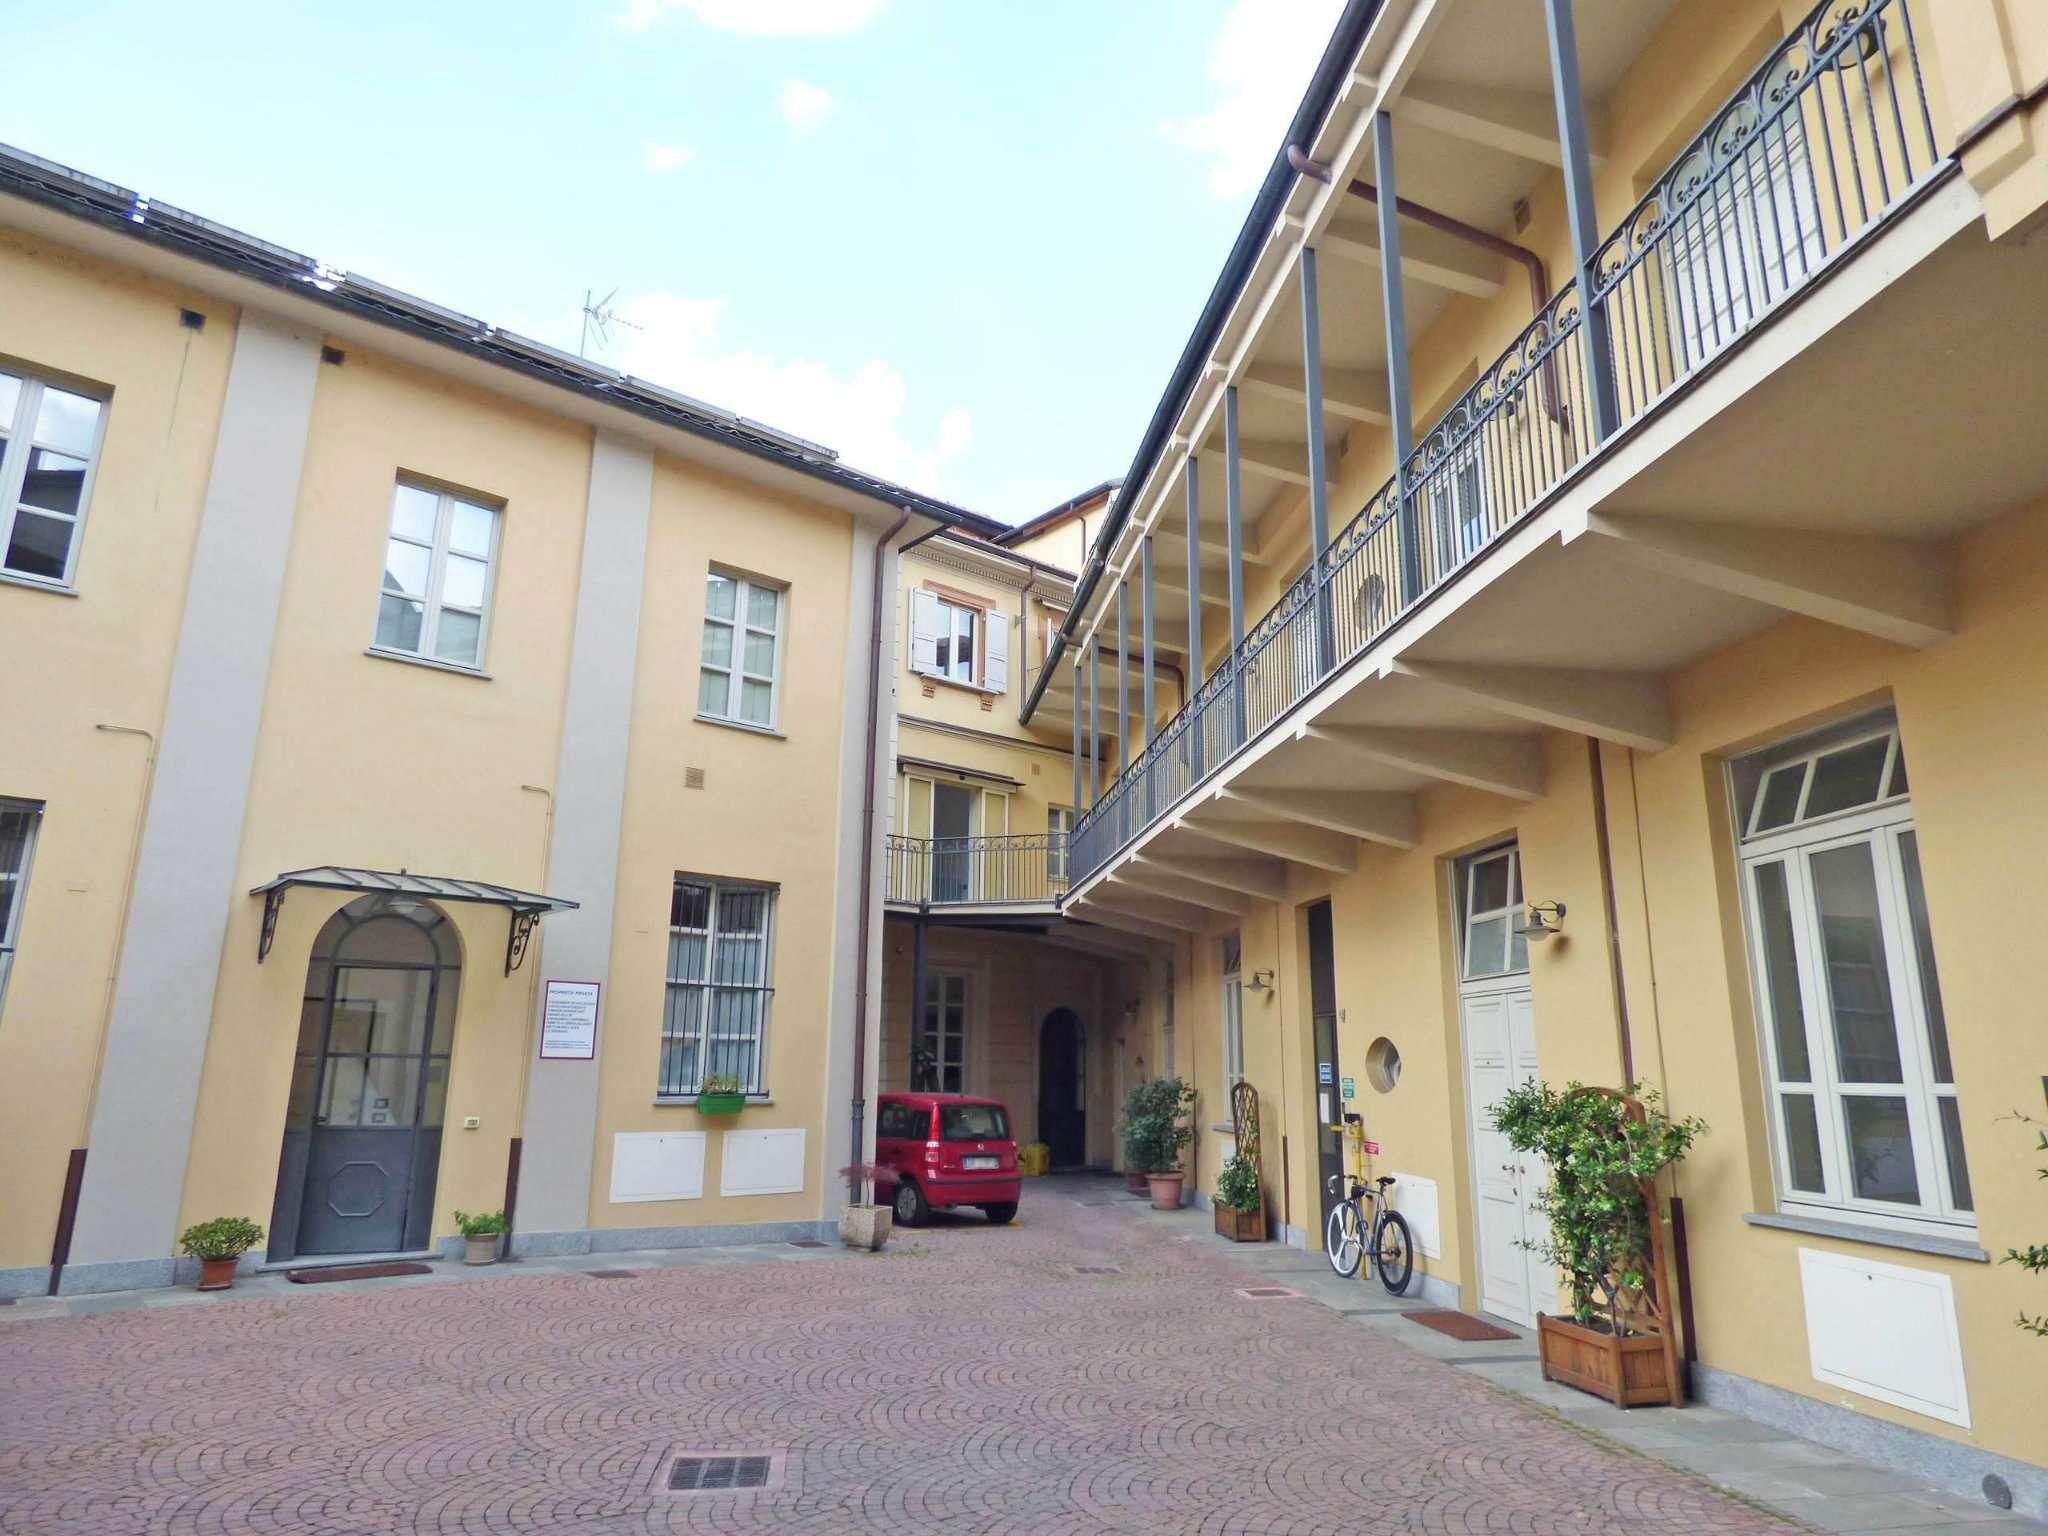 Bilocale Torino Via Balbis 1